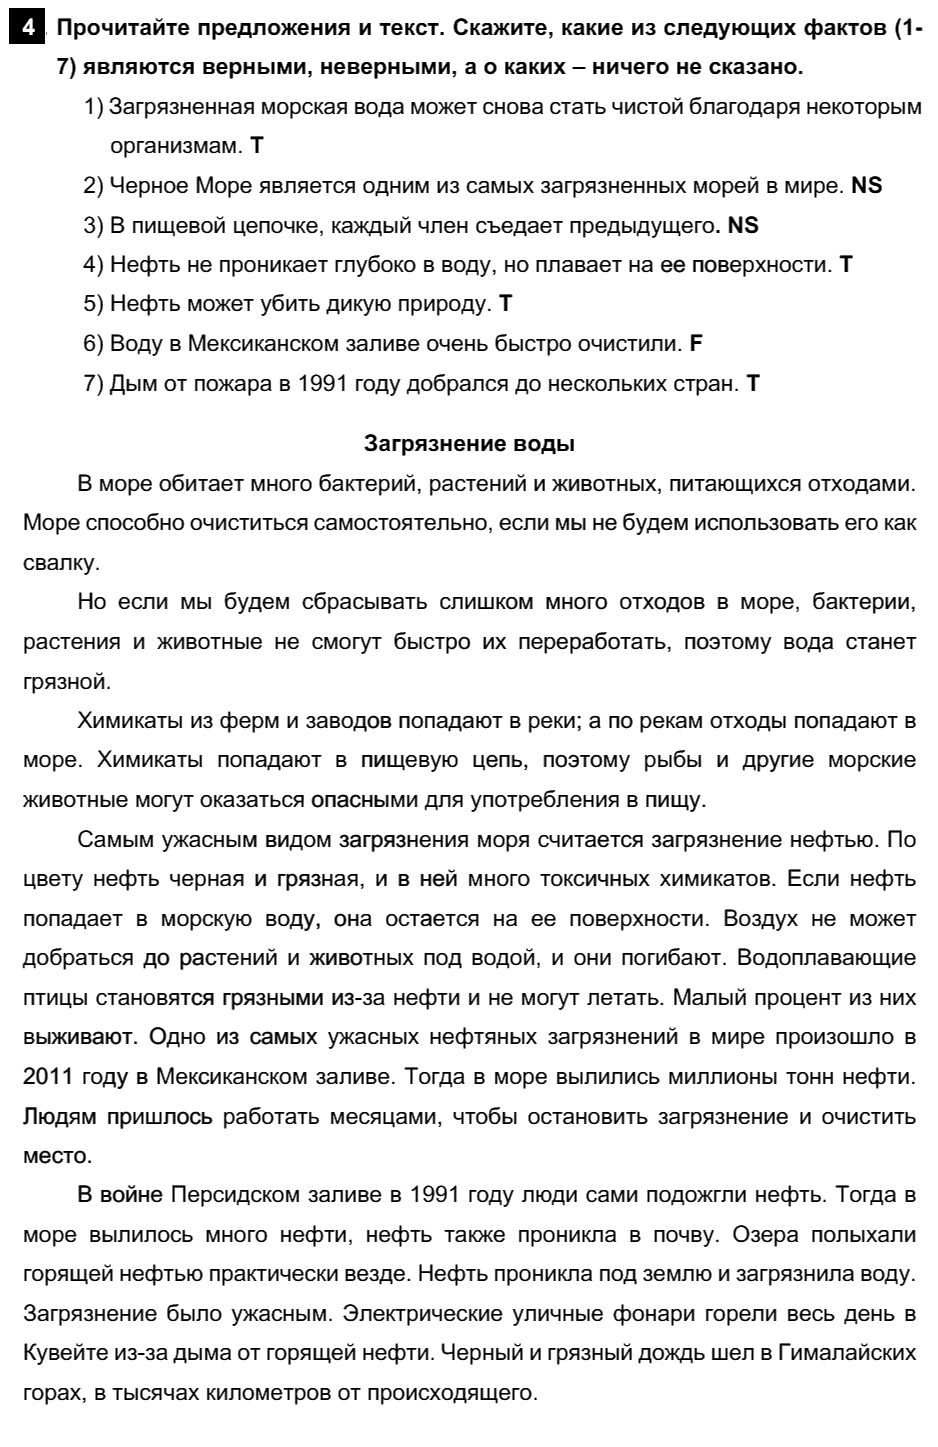 Английский язык 7 класс Афанасьева О. В. Unit 5. Экология / Шаг 8: 4